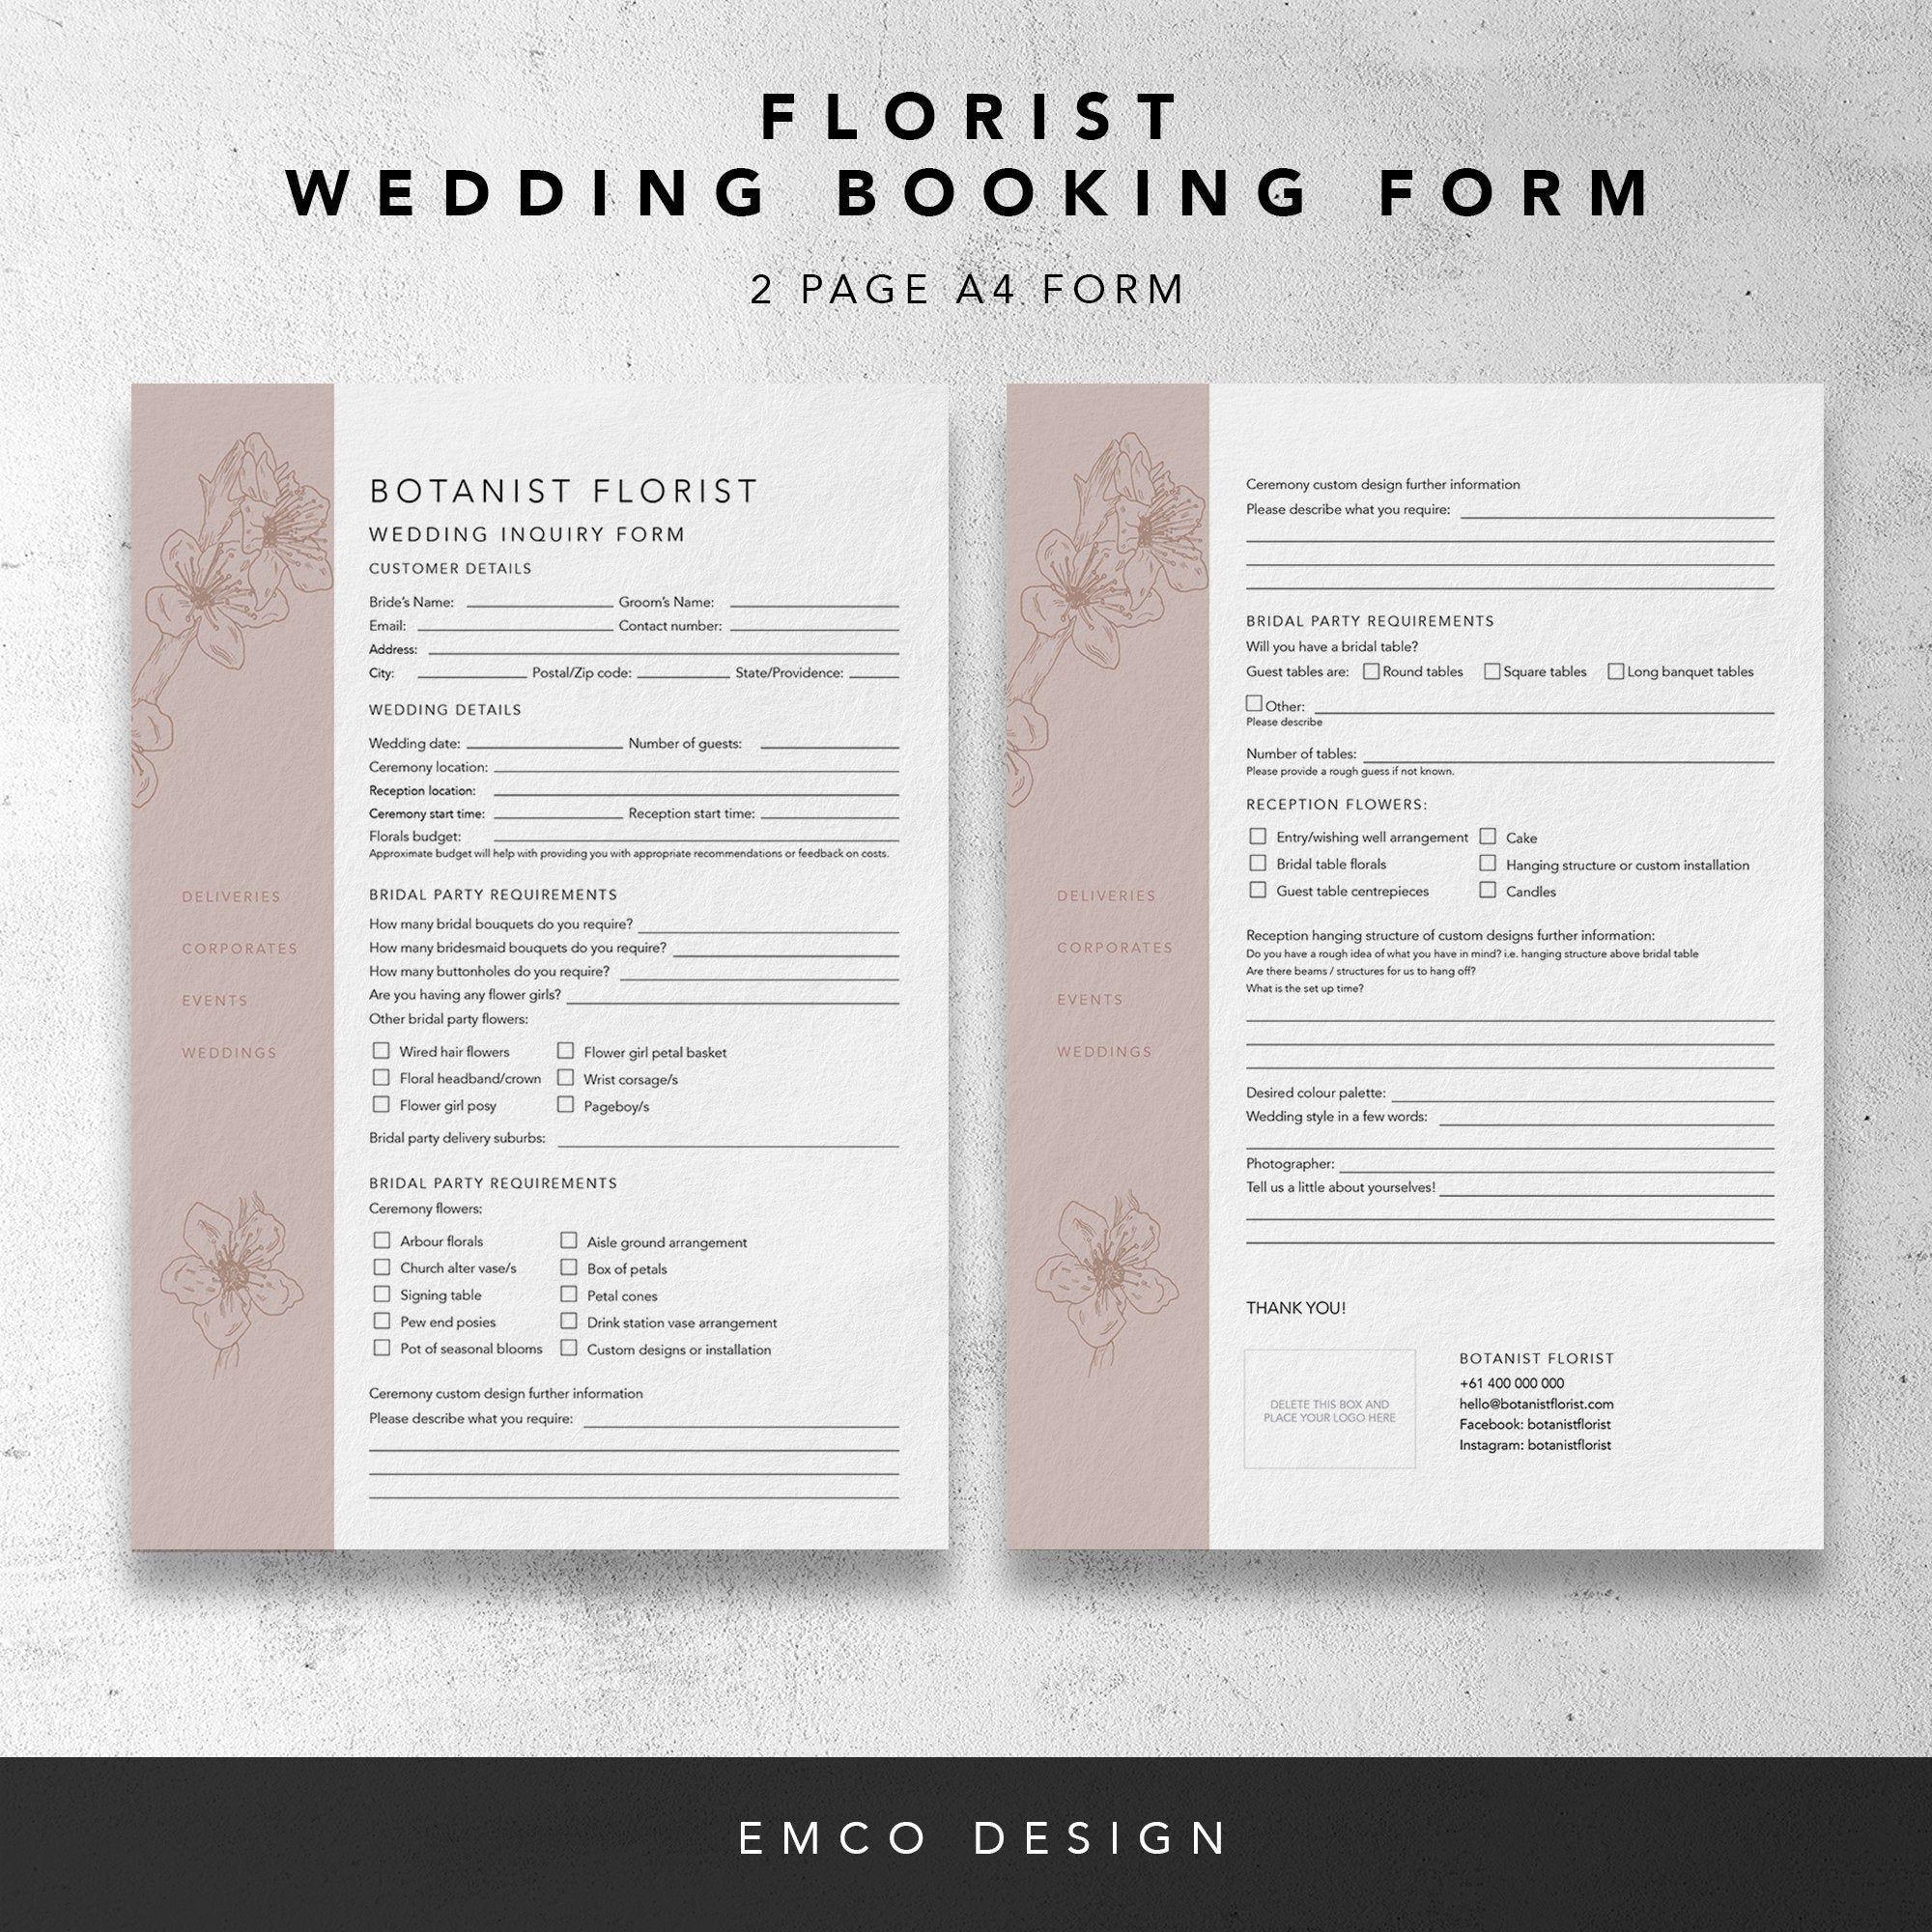 Florist Wedding Booking Form Florist Order Forms Wedding Order Forms Florist Templates Inquiry Form Invoice Design Photography Invoice Template Wedding Order Wedding flowers order form template